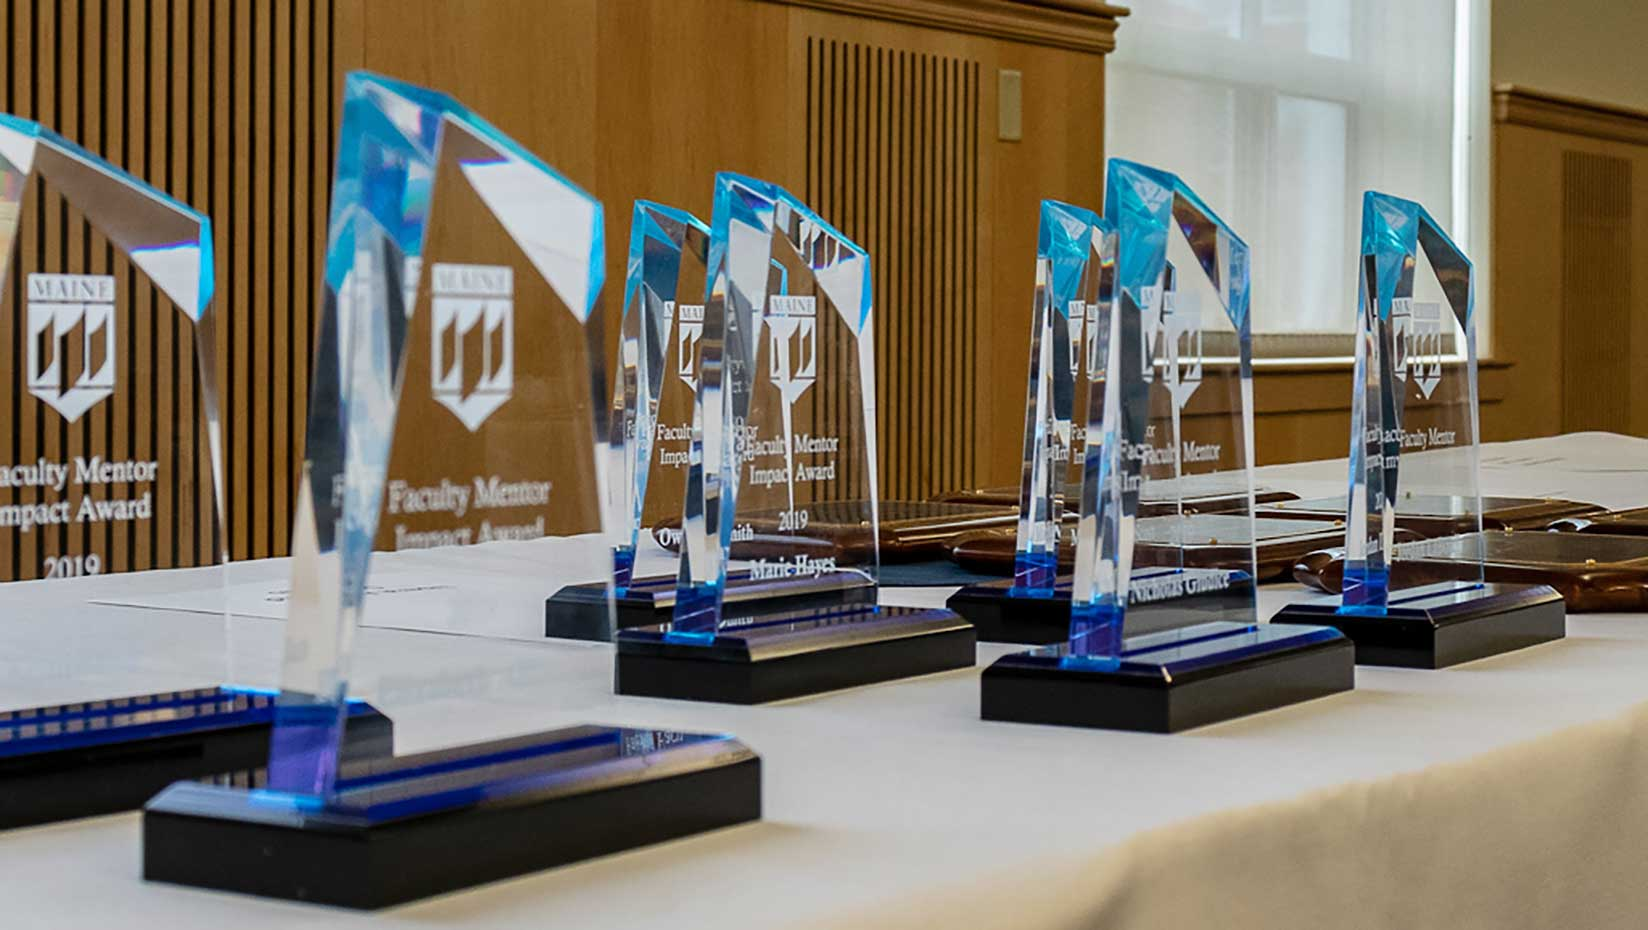 Faculty Mentor Awards image